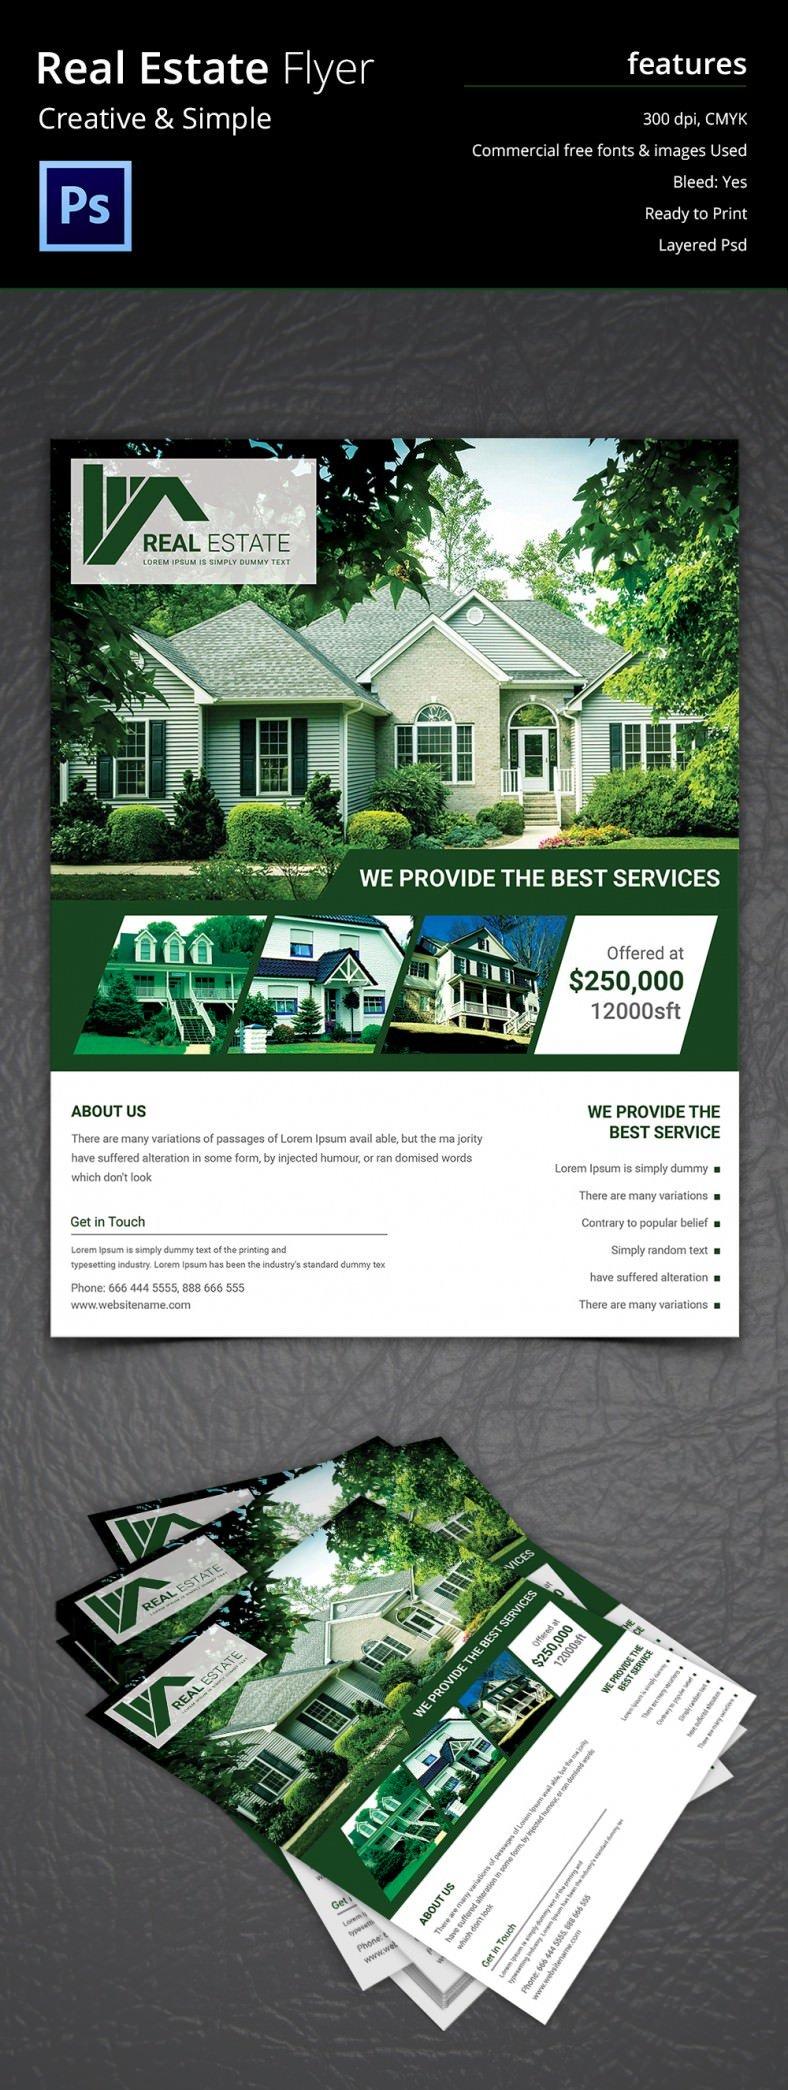 RealEstate_Flyer5